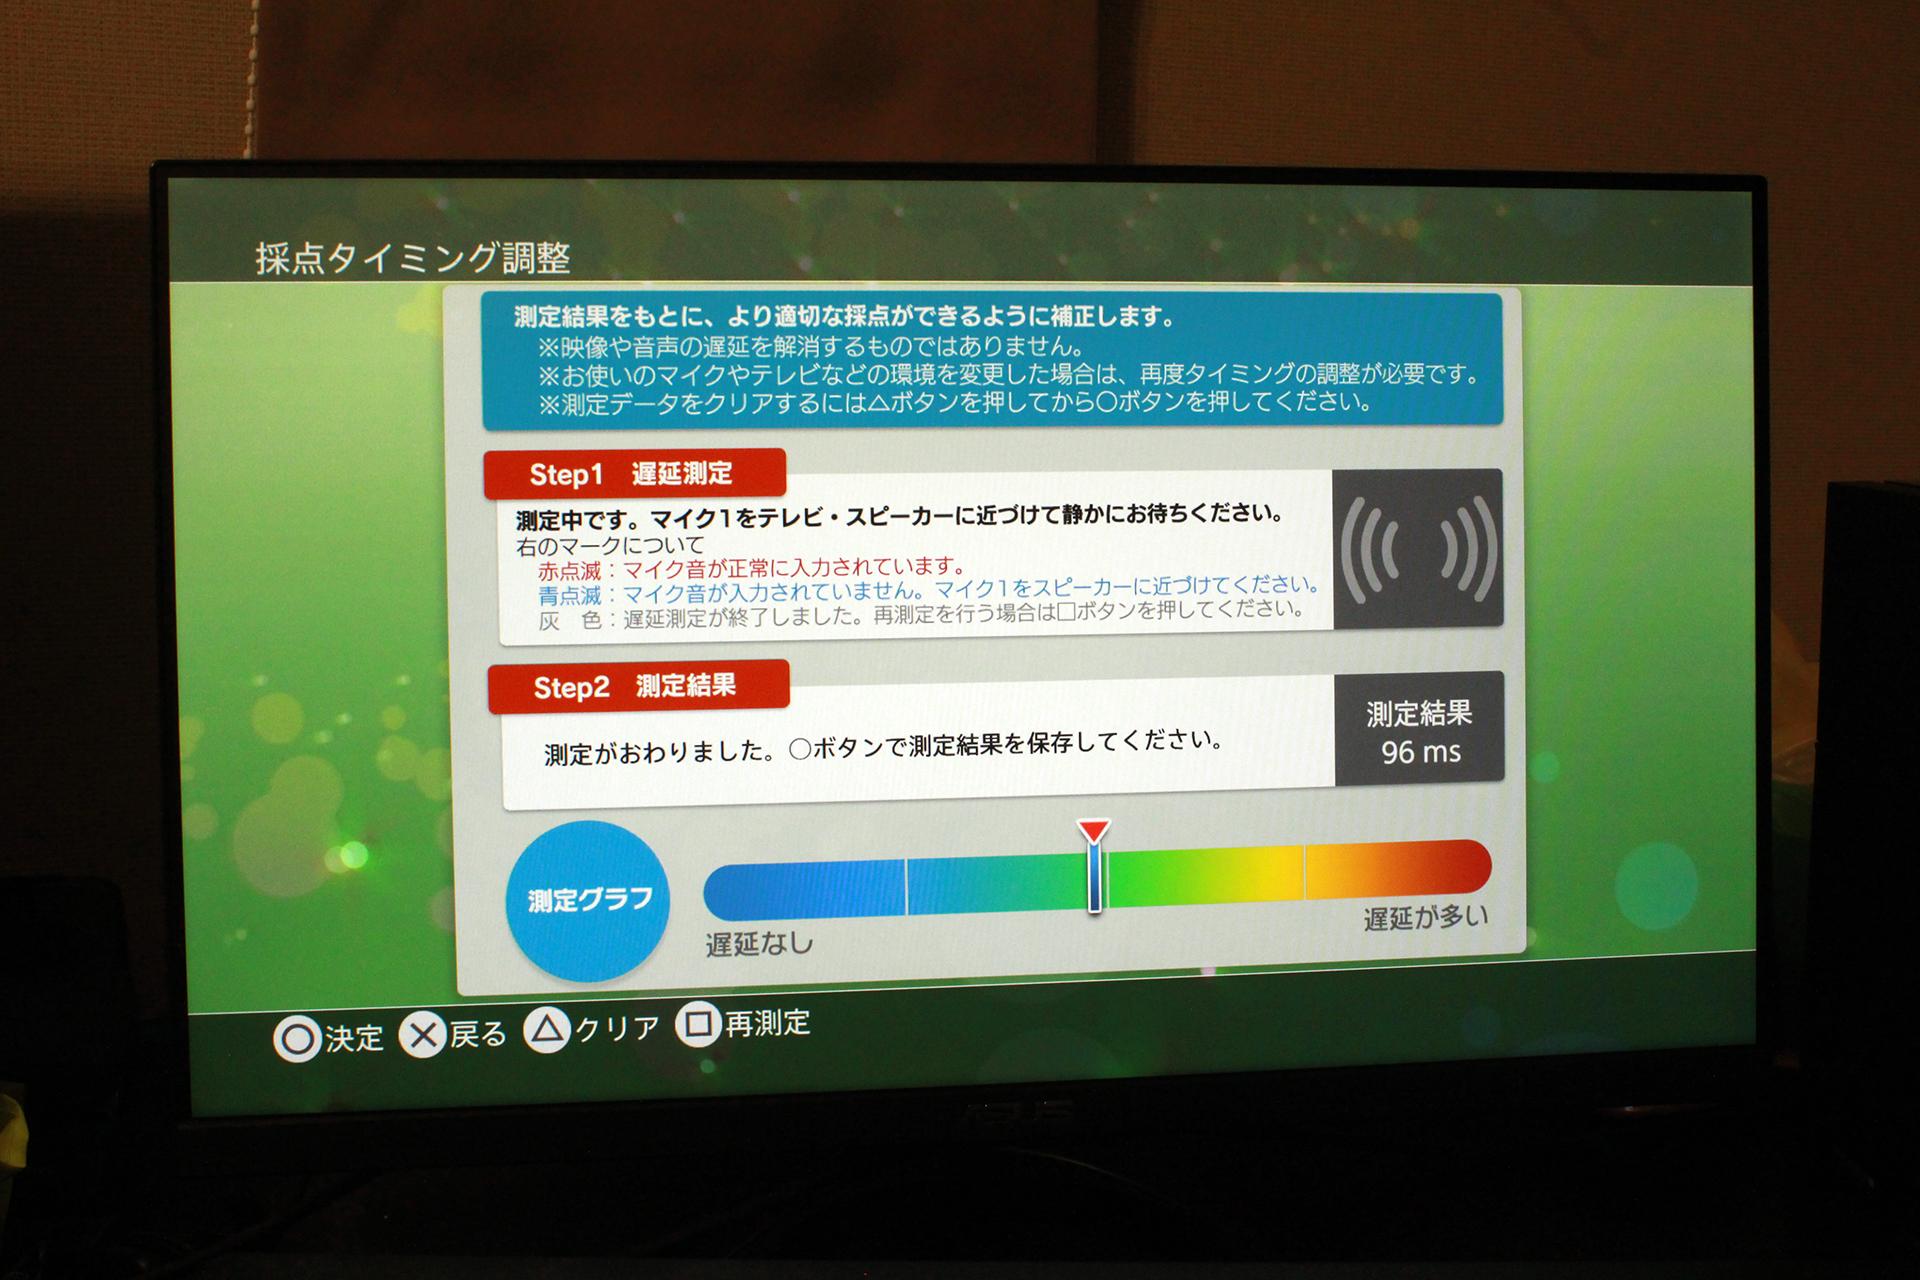 「JOYSOUND.TV Plus」の遅延チェック